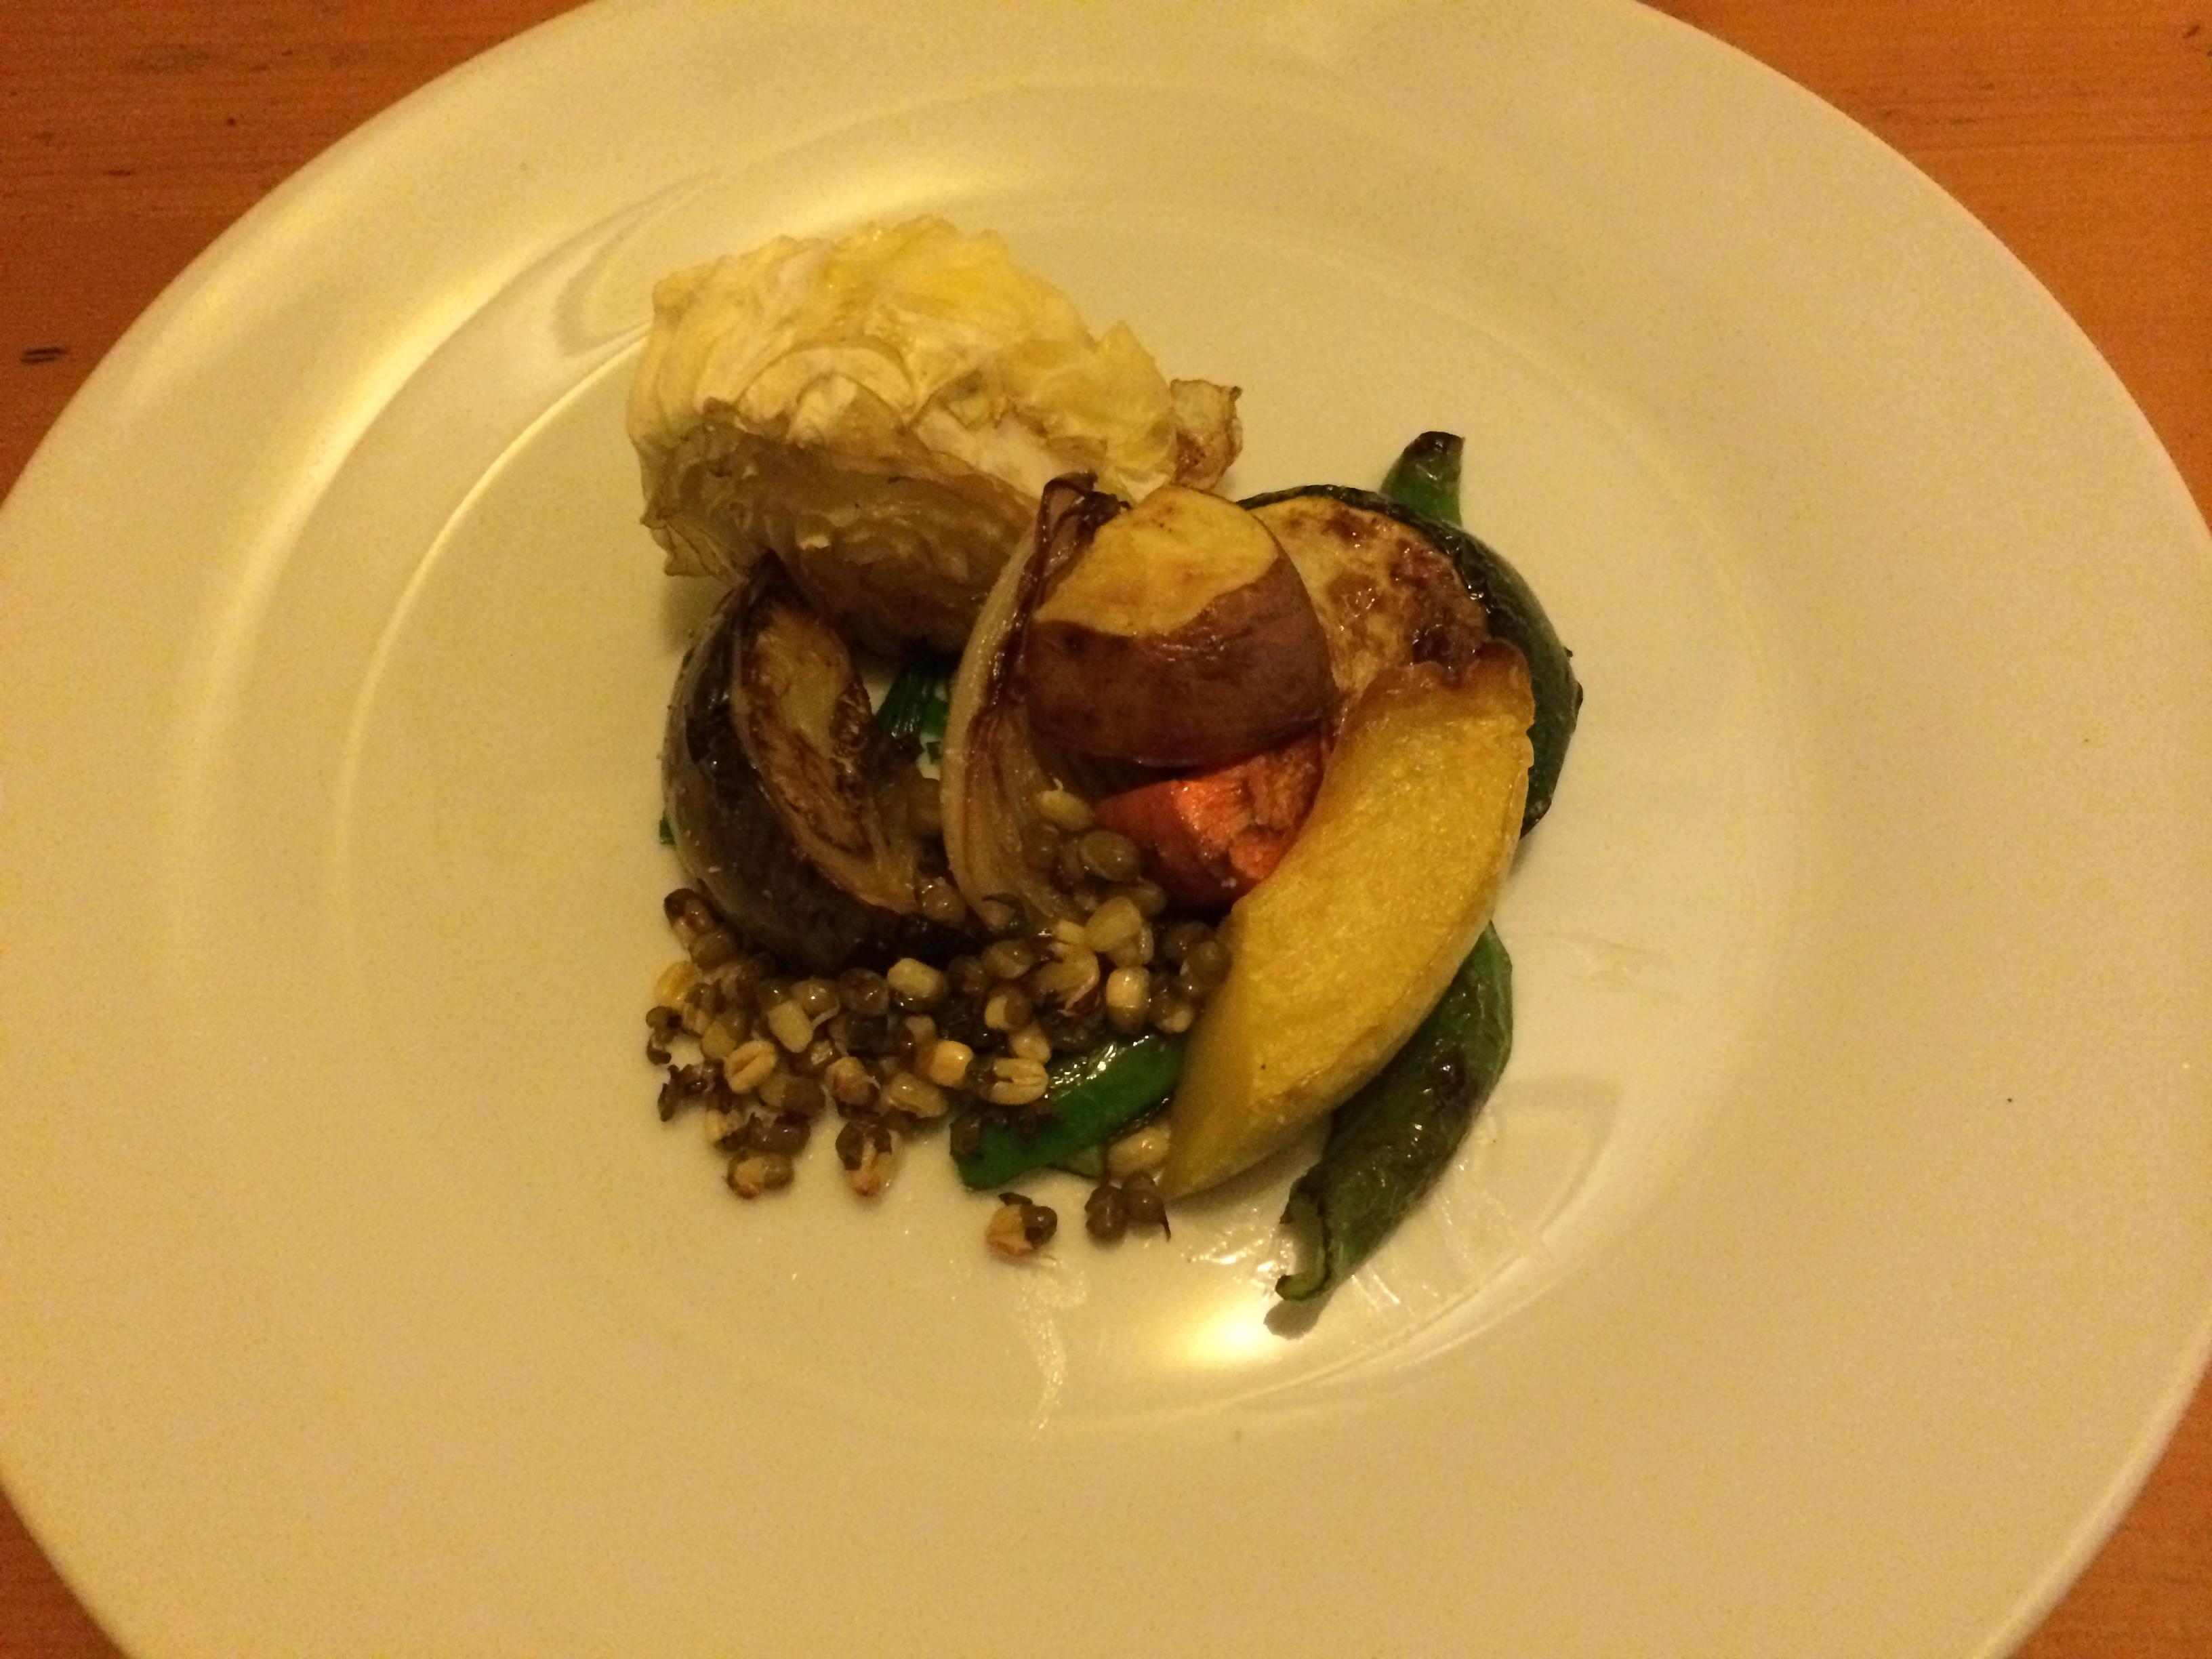 Bistro la fourchette美山野菜のオーブン焼き